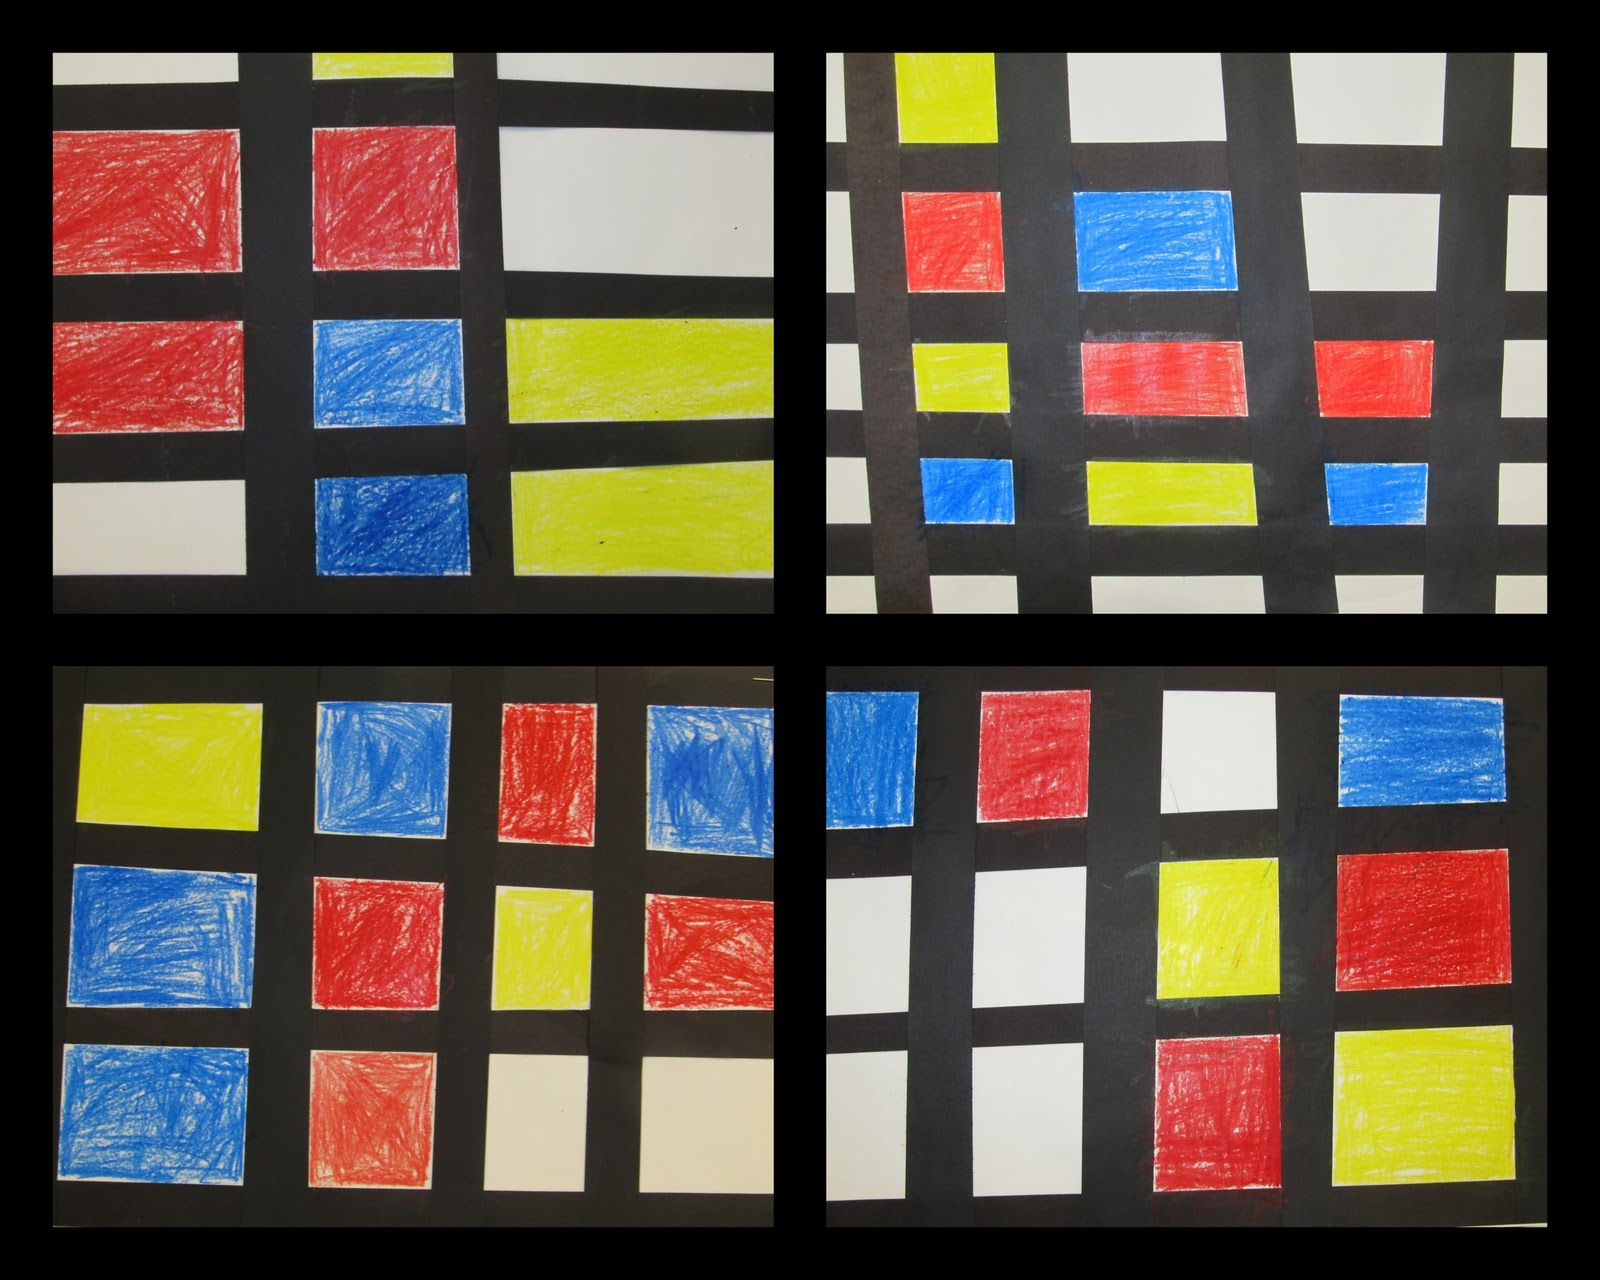 Www Rainbowswithinreach Blogspot Com Mondriaan Kunstprojecten Knutselwerk